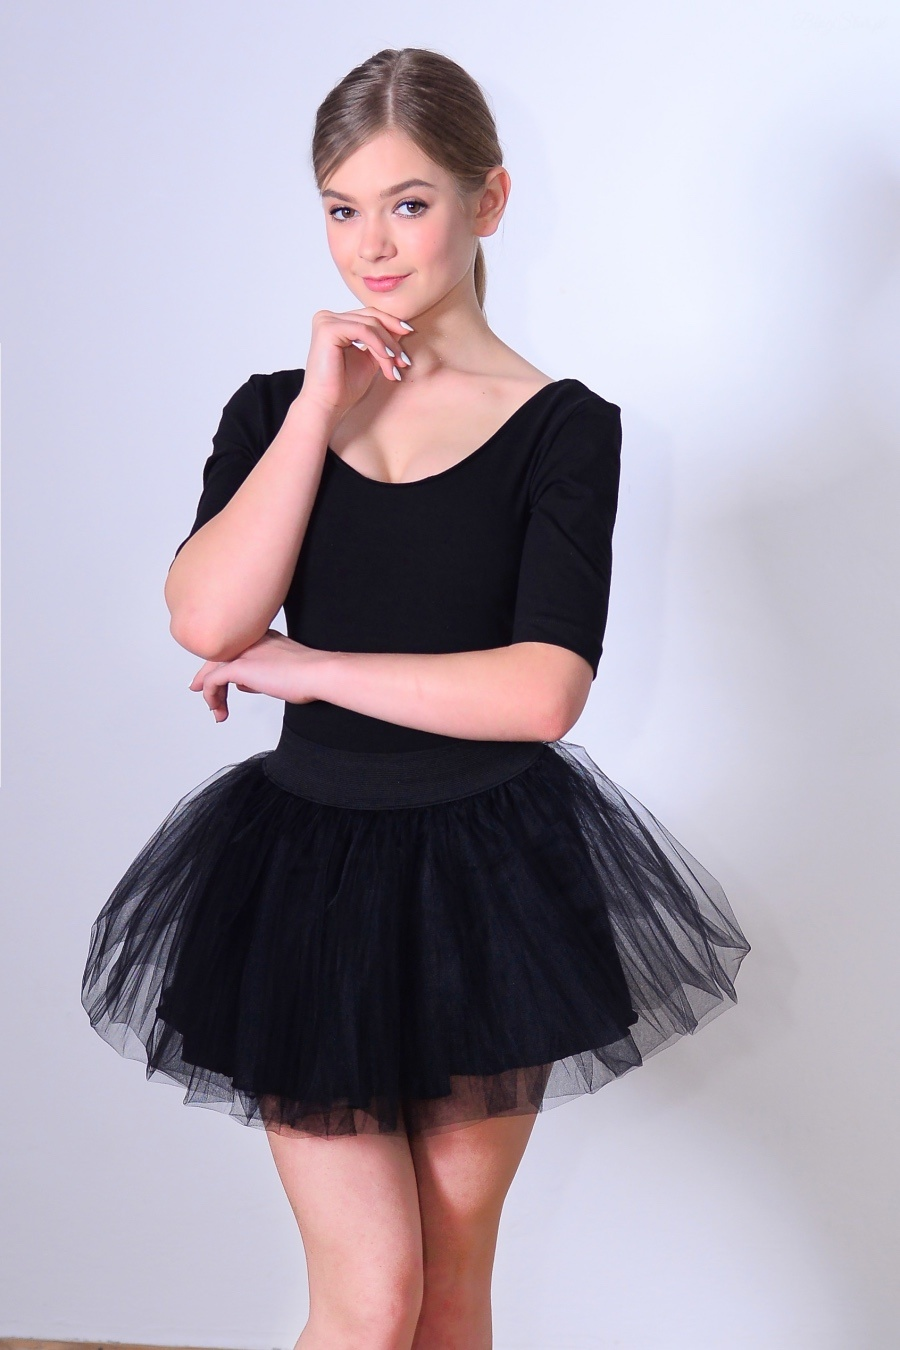 julia_wroblewska_tutu_princess_mini2